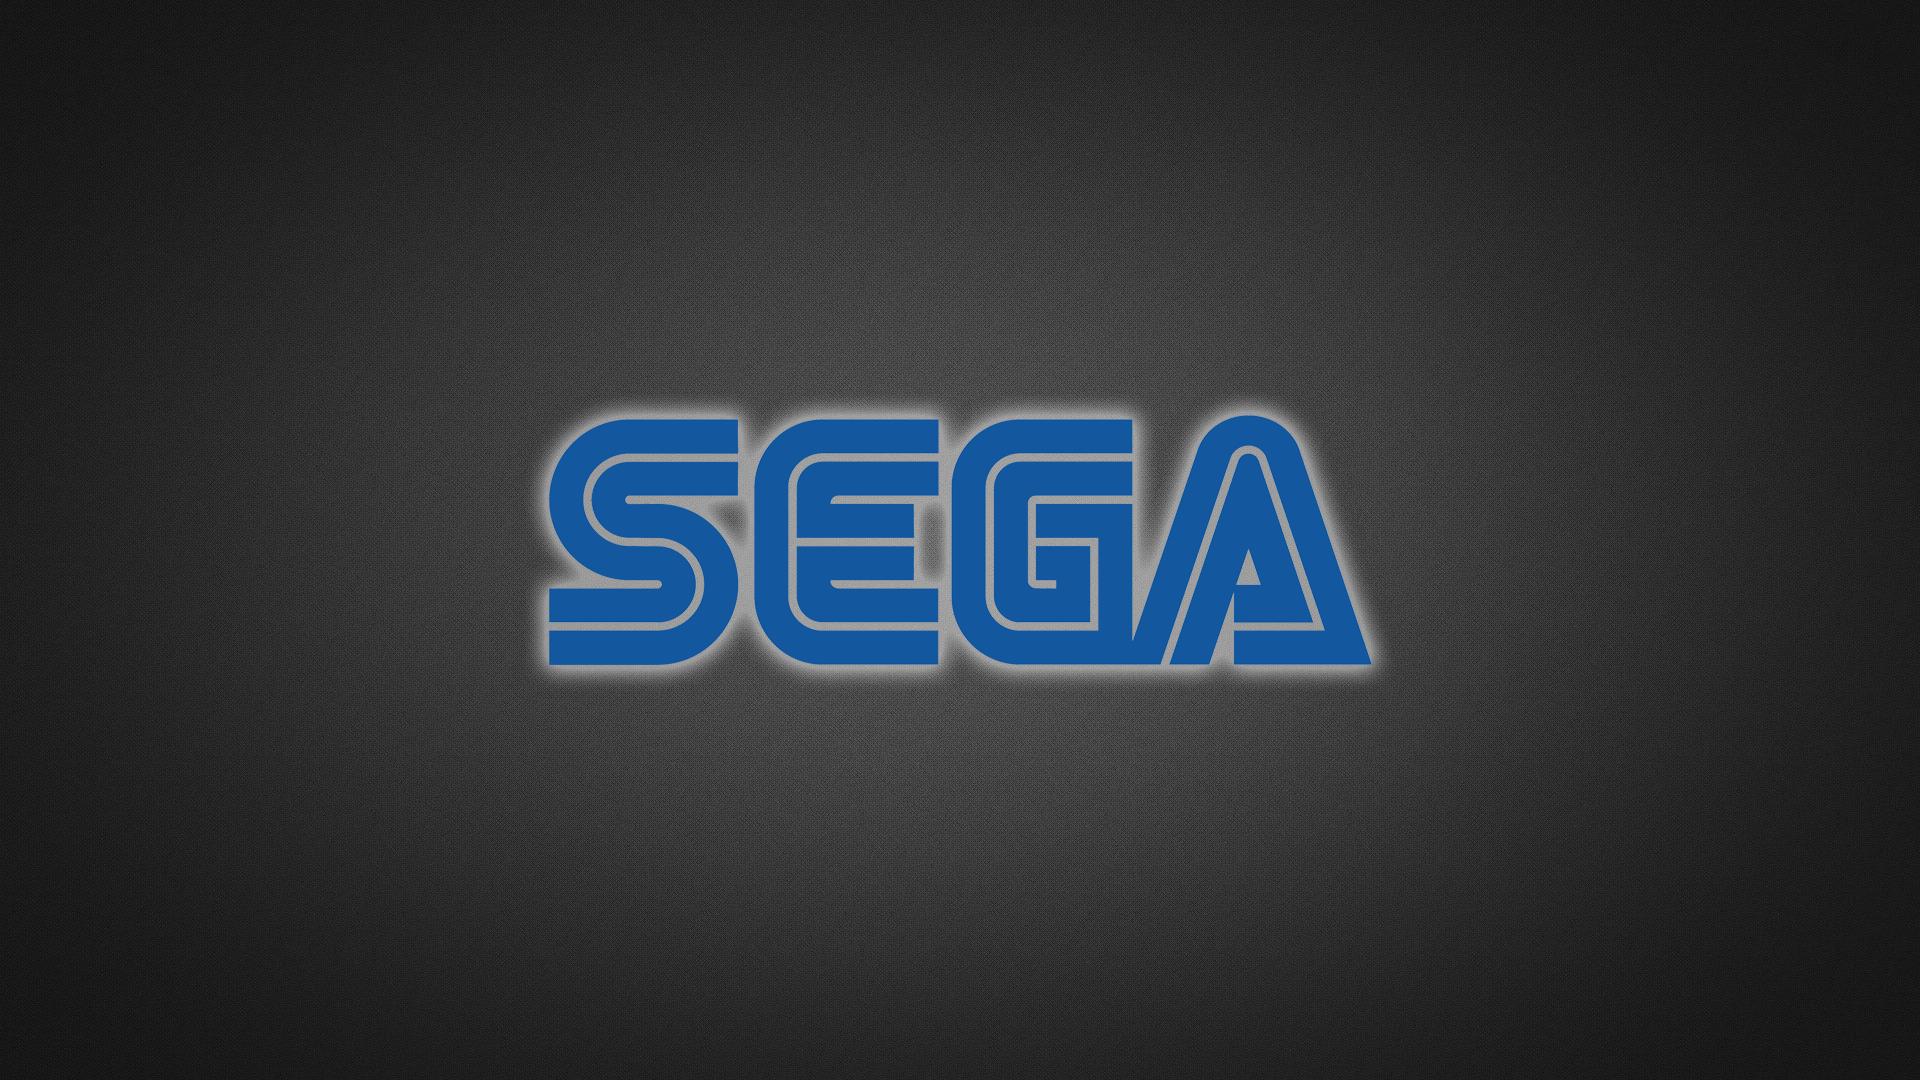 SEGA logo wallpaper (1920 x 1080) by festivus31 on DeviantArt